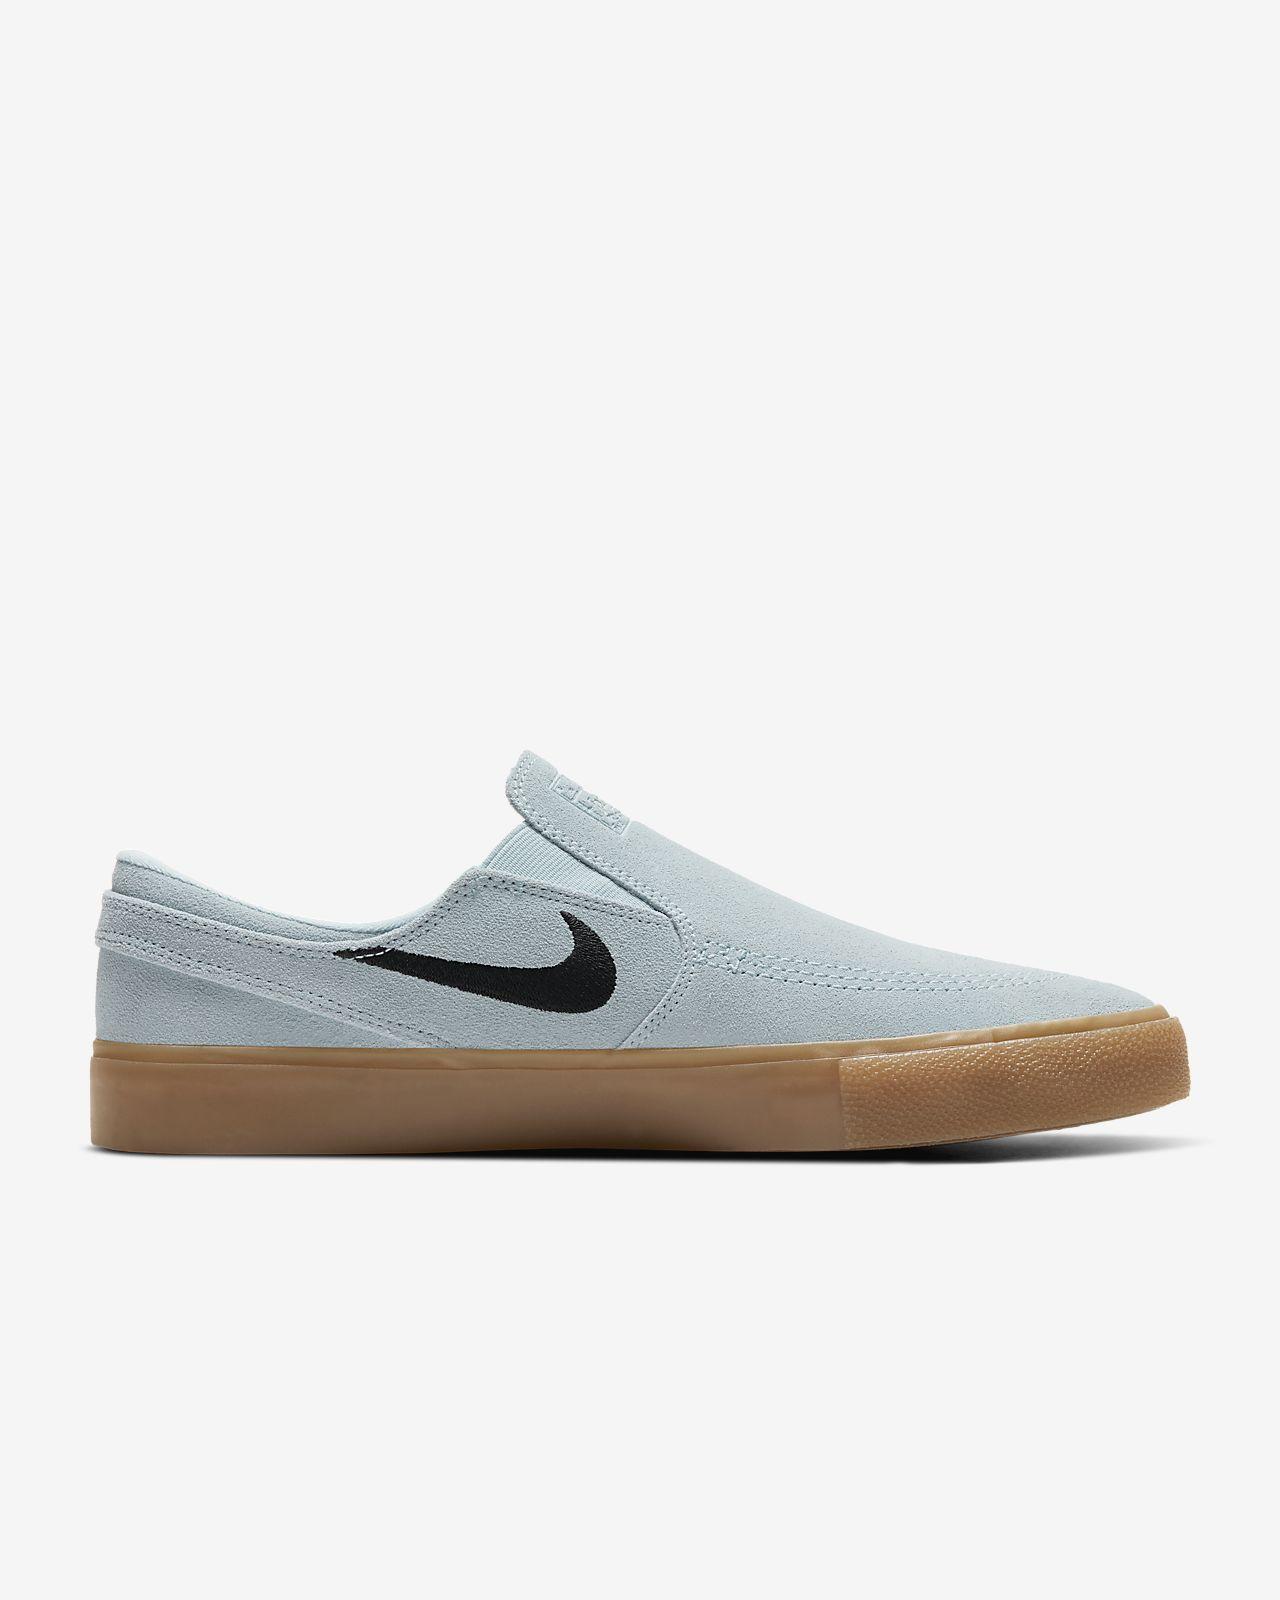 Sapatilhas de skateboard Nike SB Zoom Stefan Janoski Slip RM